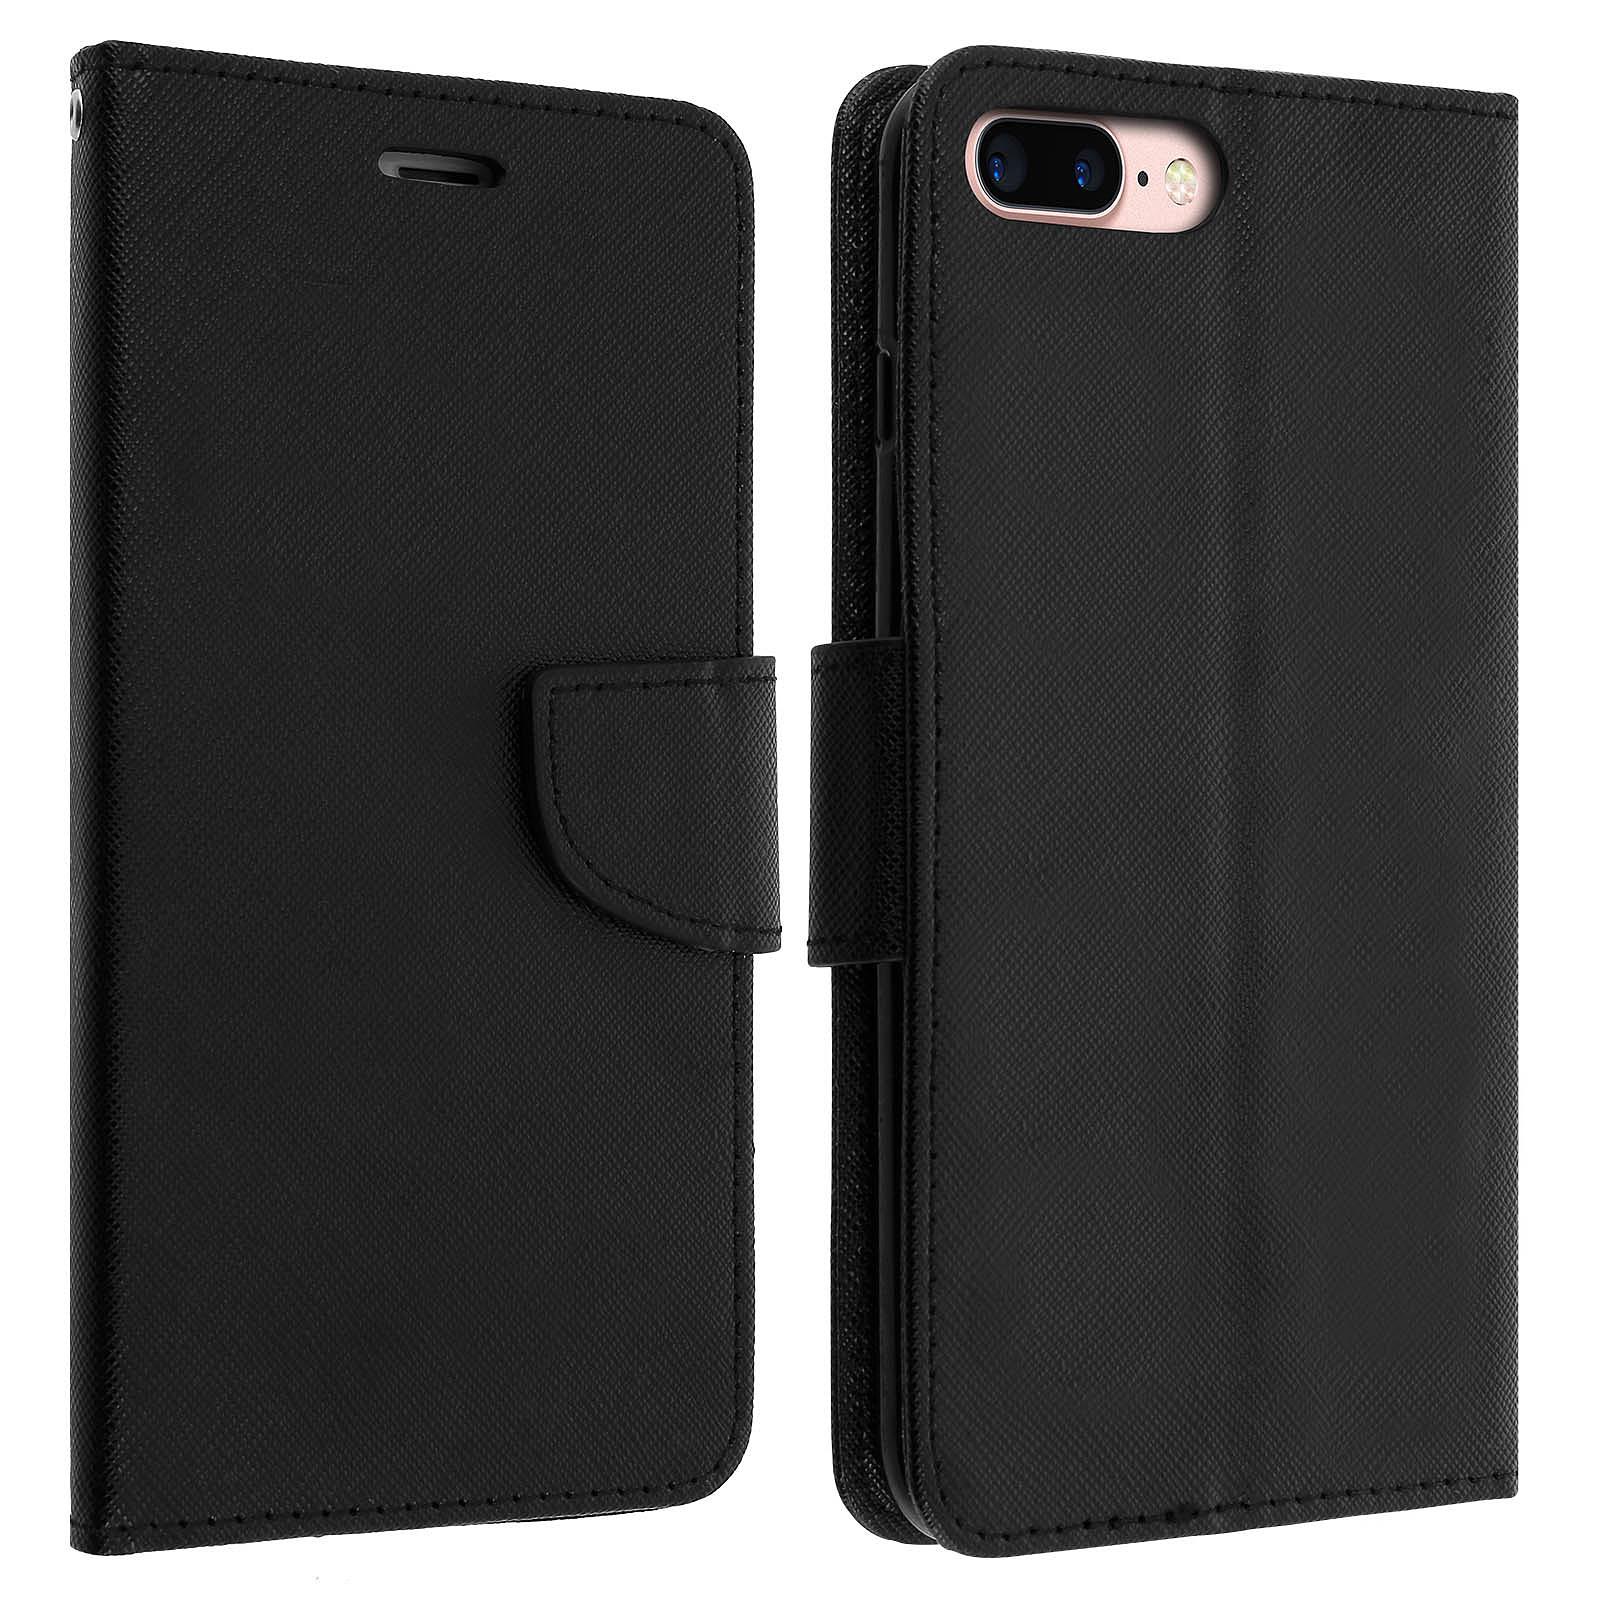 Avizar Etui folio Noir pour Apple iPhone 7 Plus , Apple iPhone 8 Plus